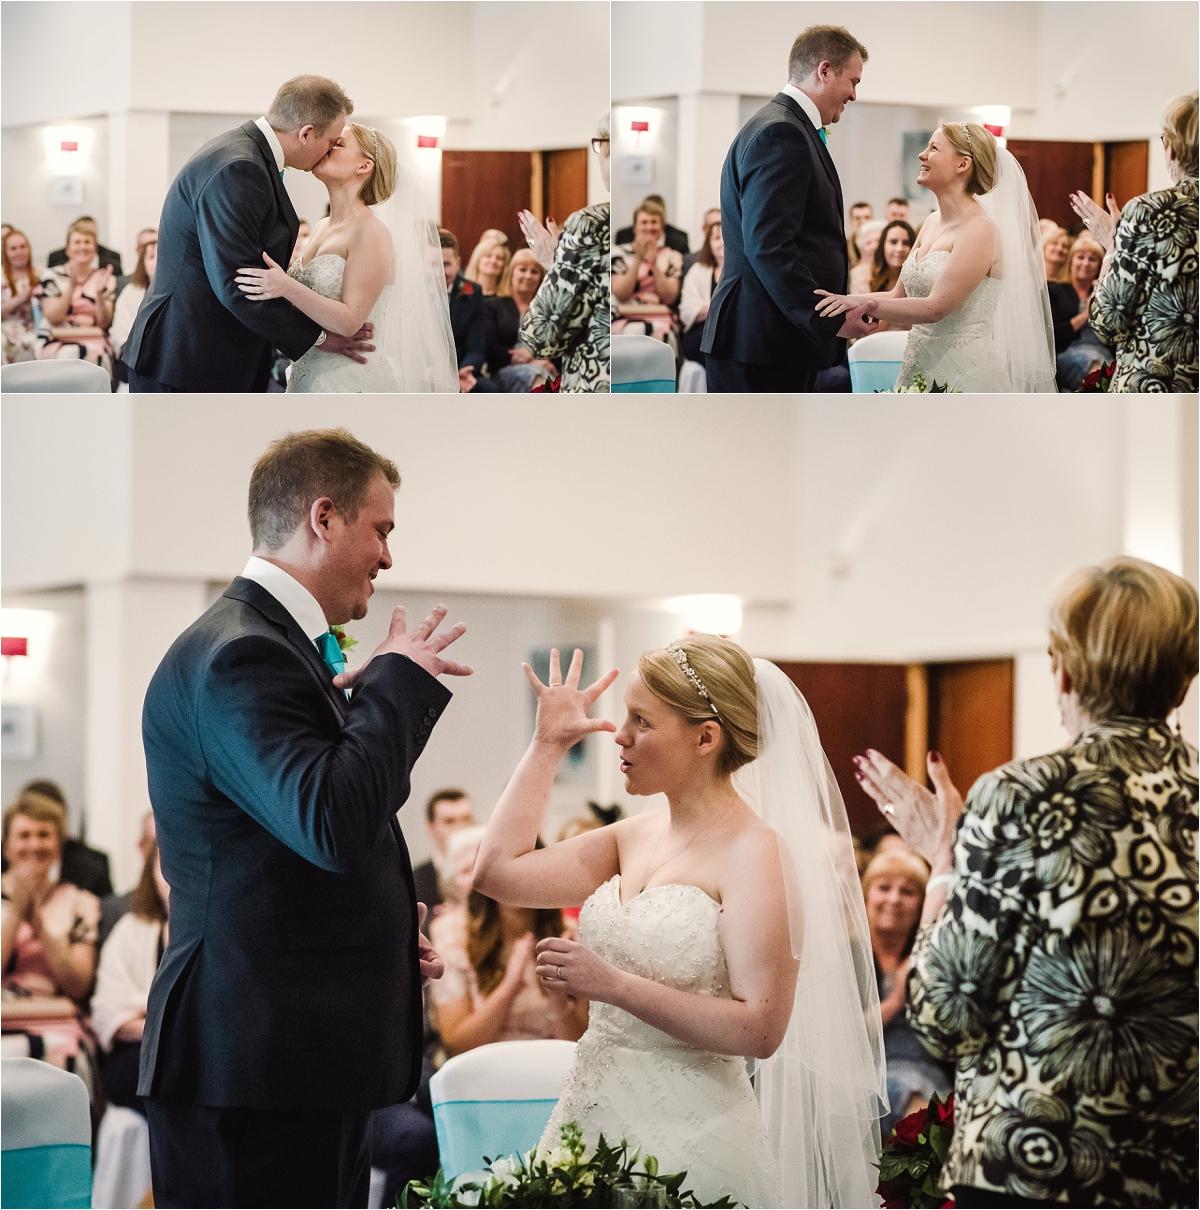 dan_emma_wedding_0013.jpg